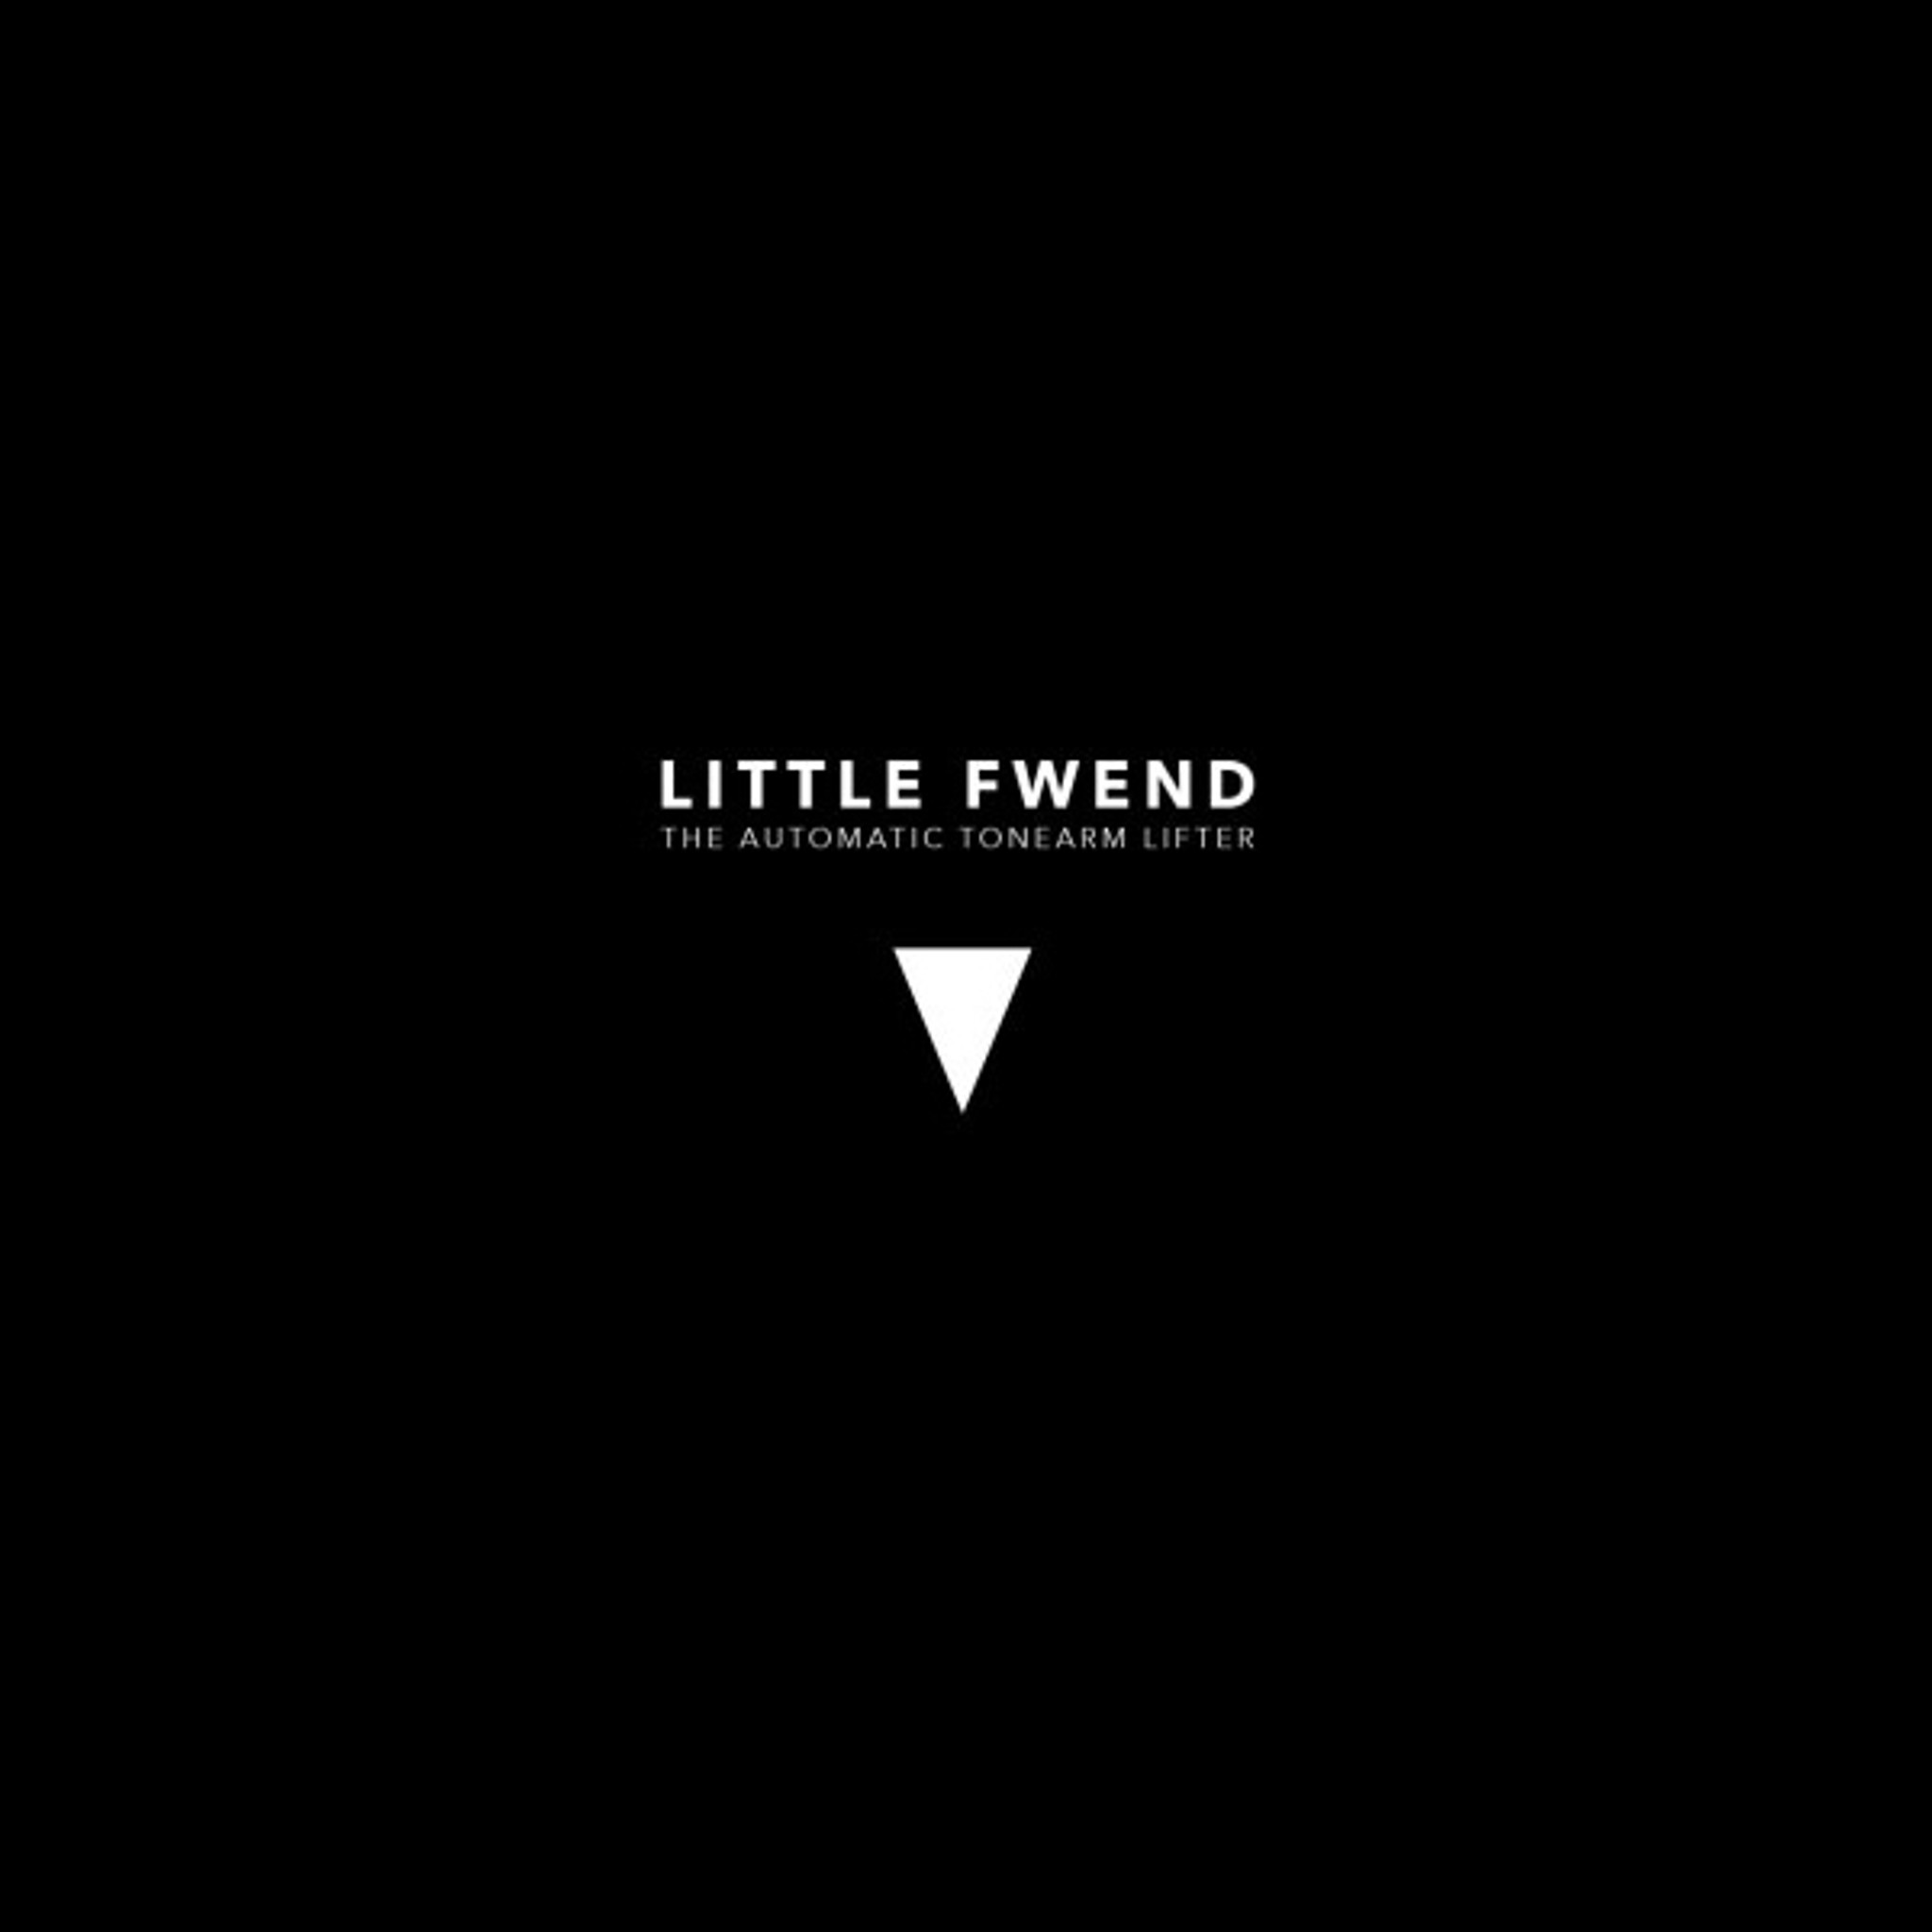 Little Fwend